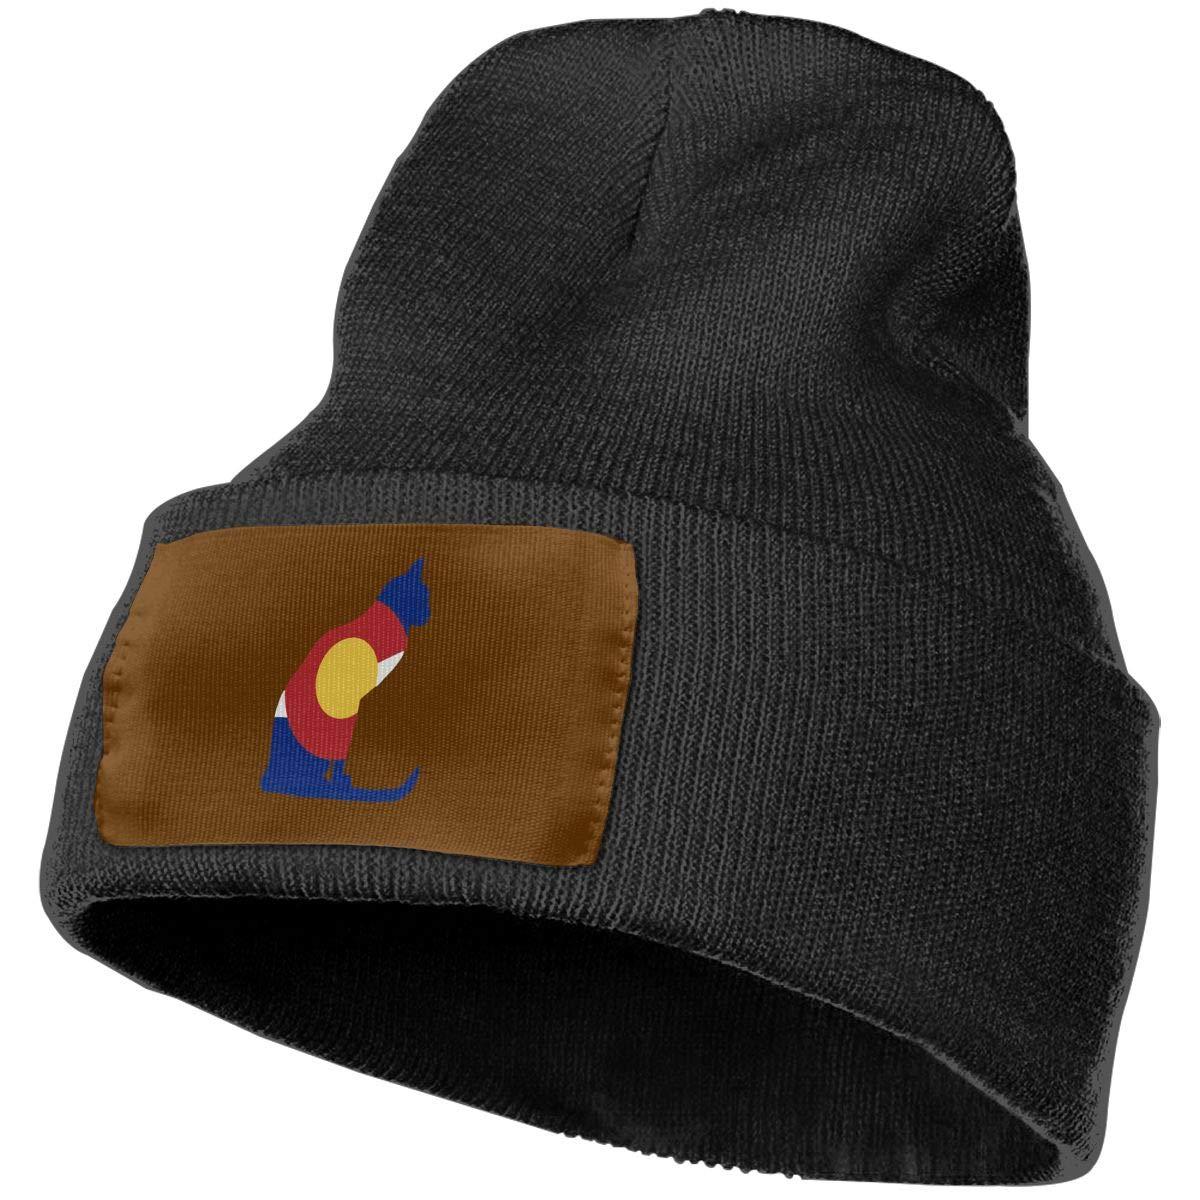 JZMY6 American Flag The USA Winter Warm Beanie Hat Men Beanie